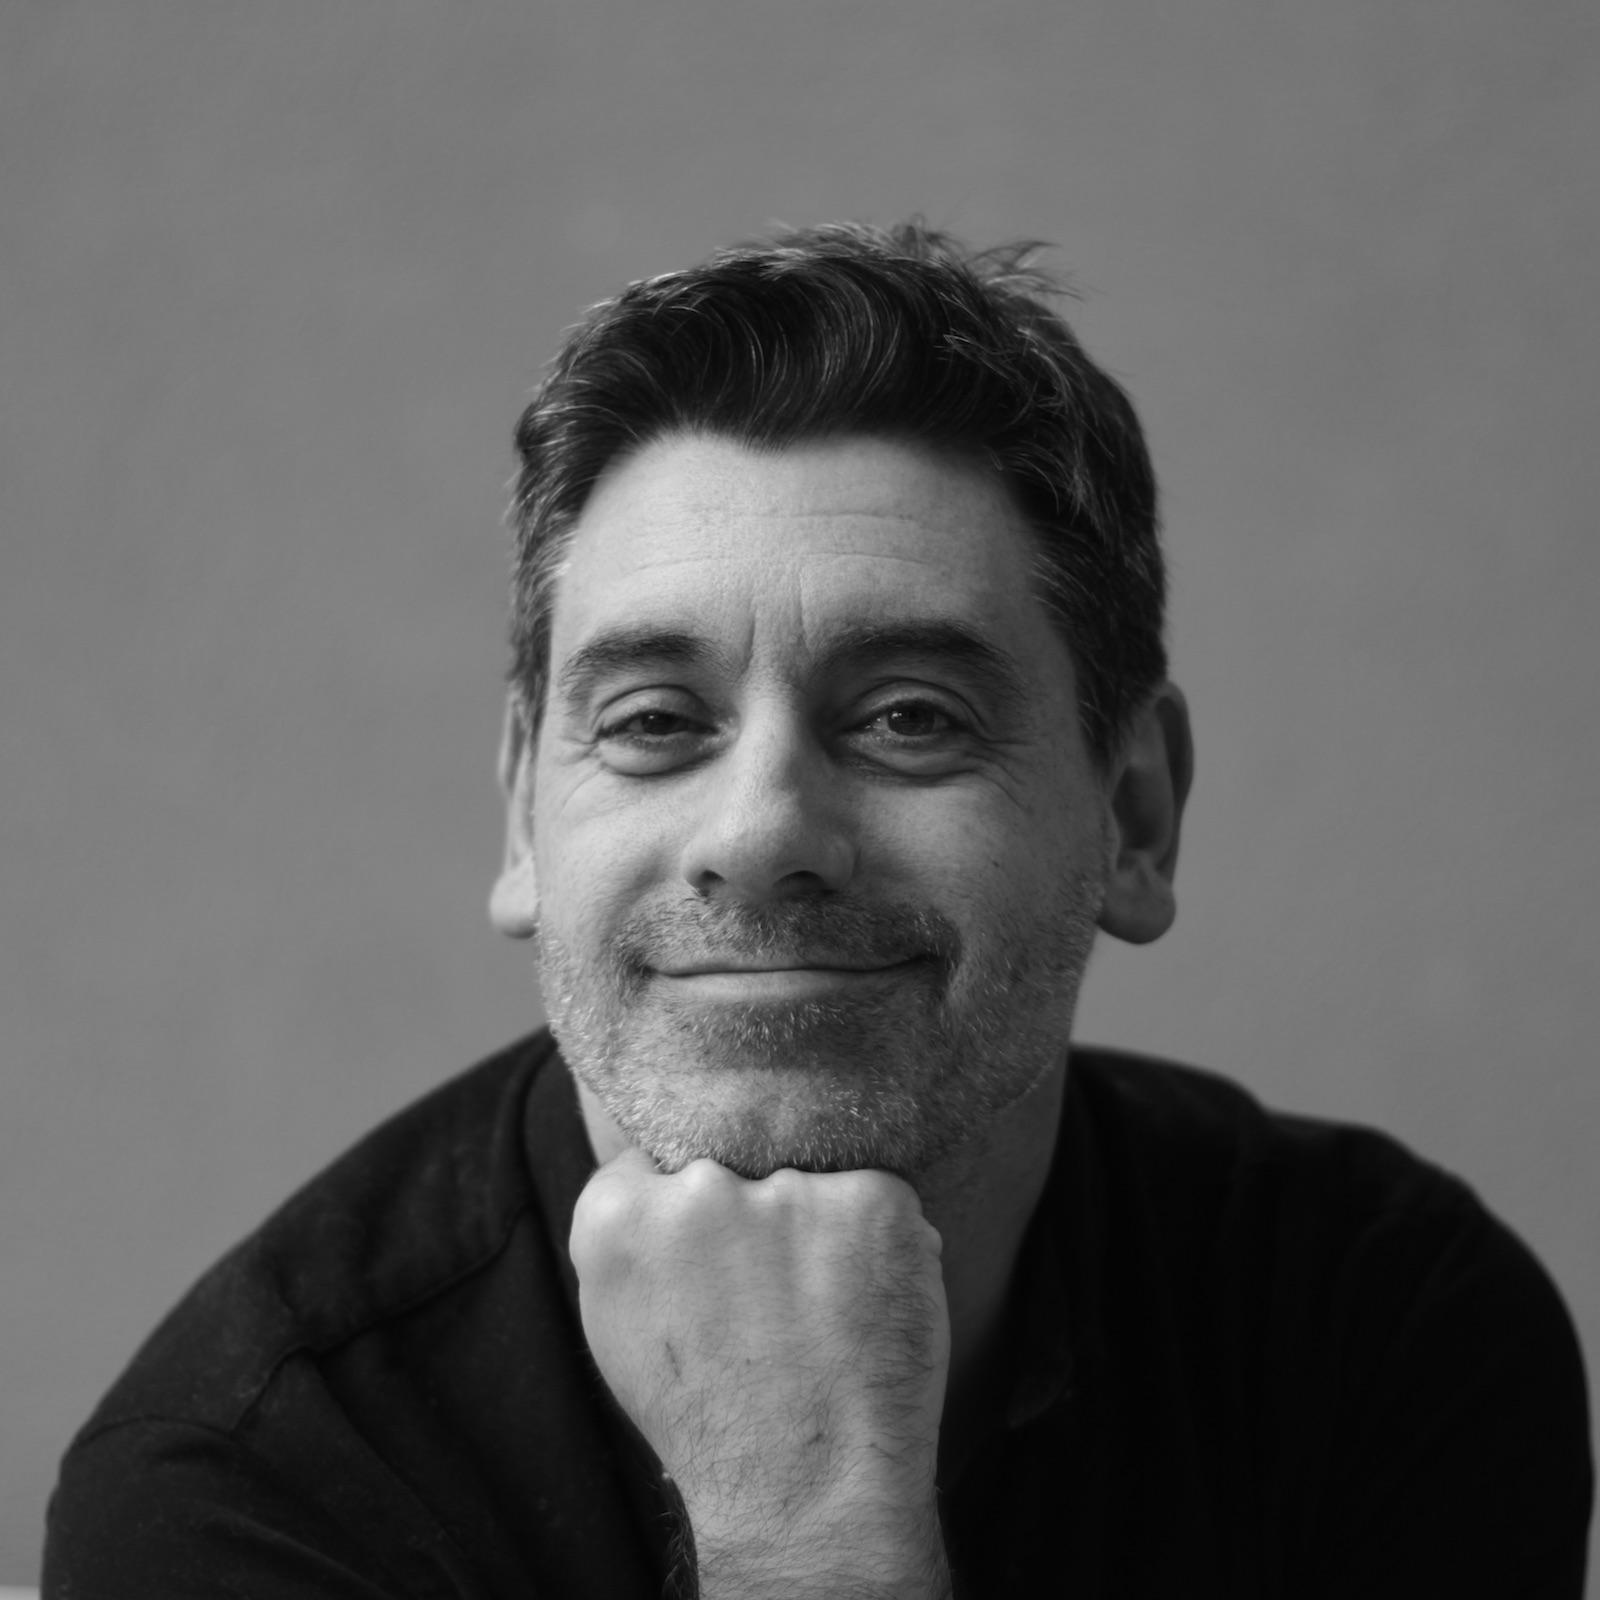 Miguel Carvalho - Jury - True Story Award